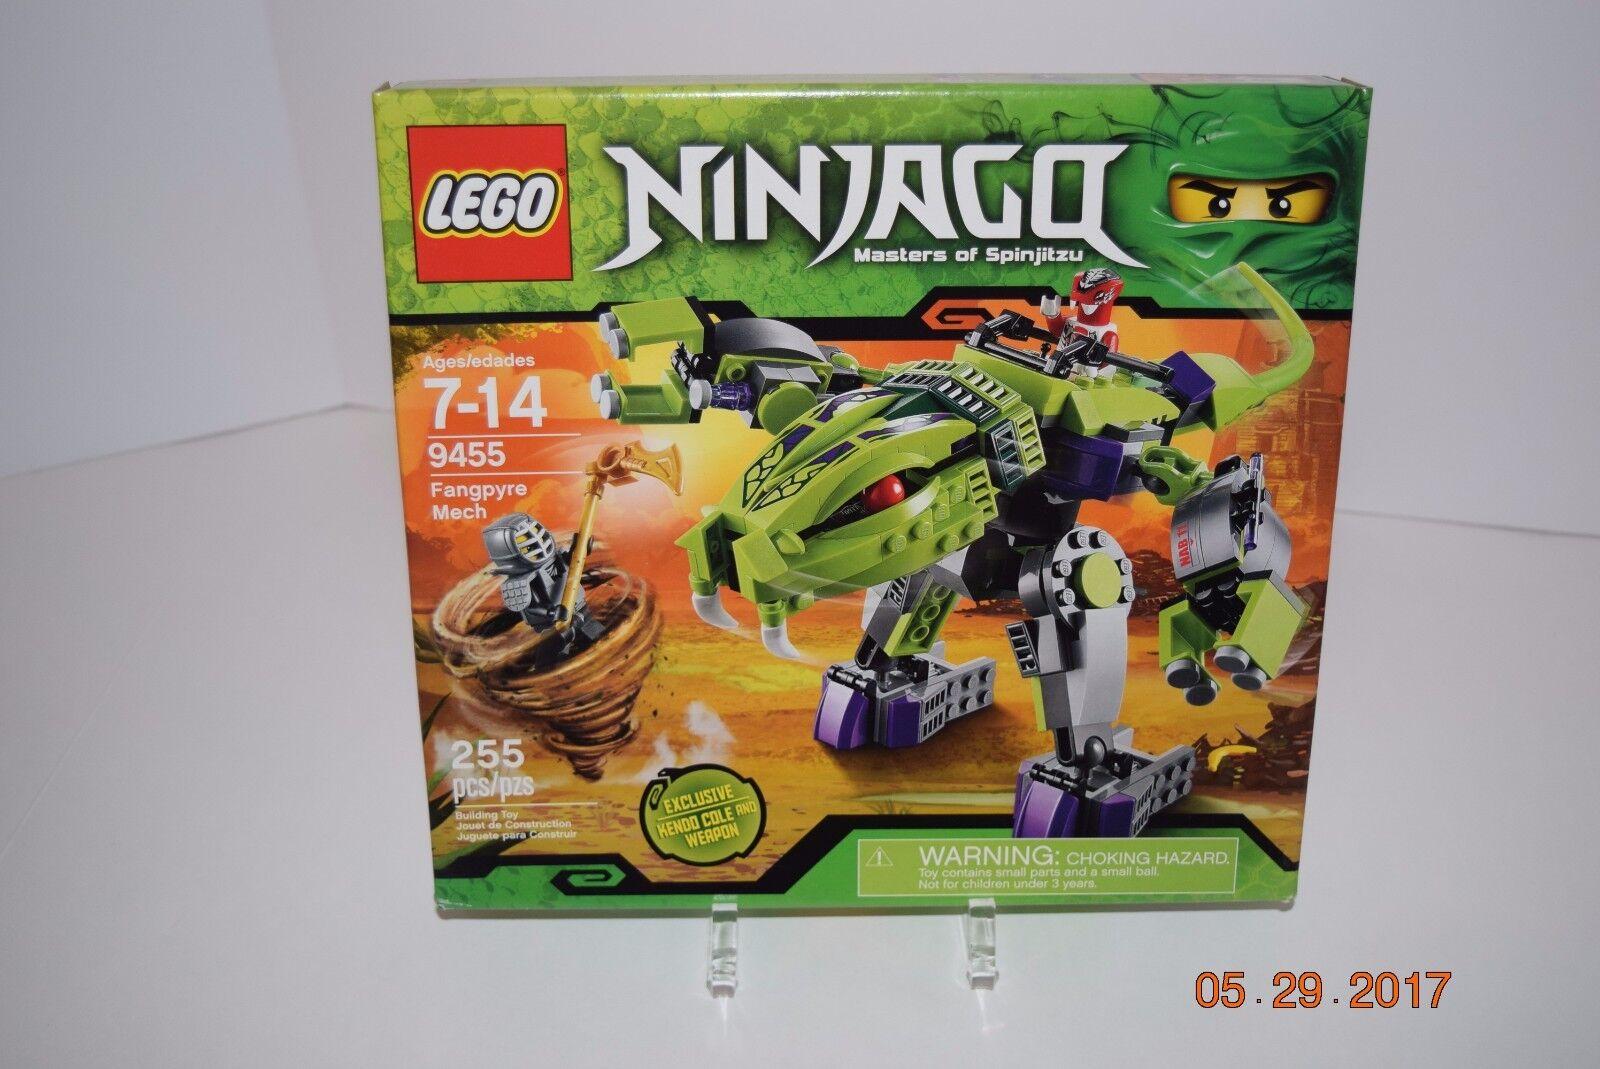 Lego NINJAGO 9455 --Fangypre Mech - Age 7+, 225 pcs --Sealed -- Retirosso --- NEW